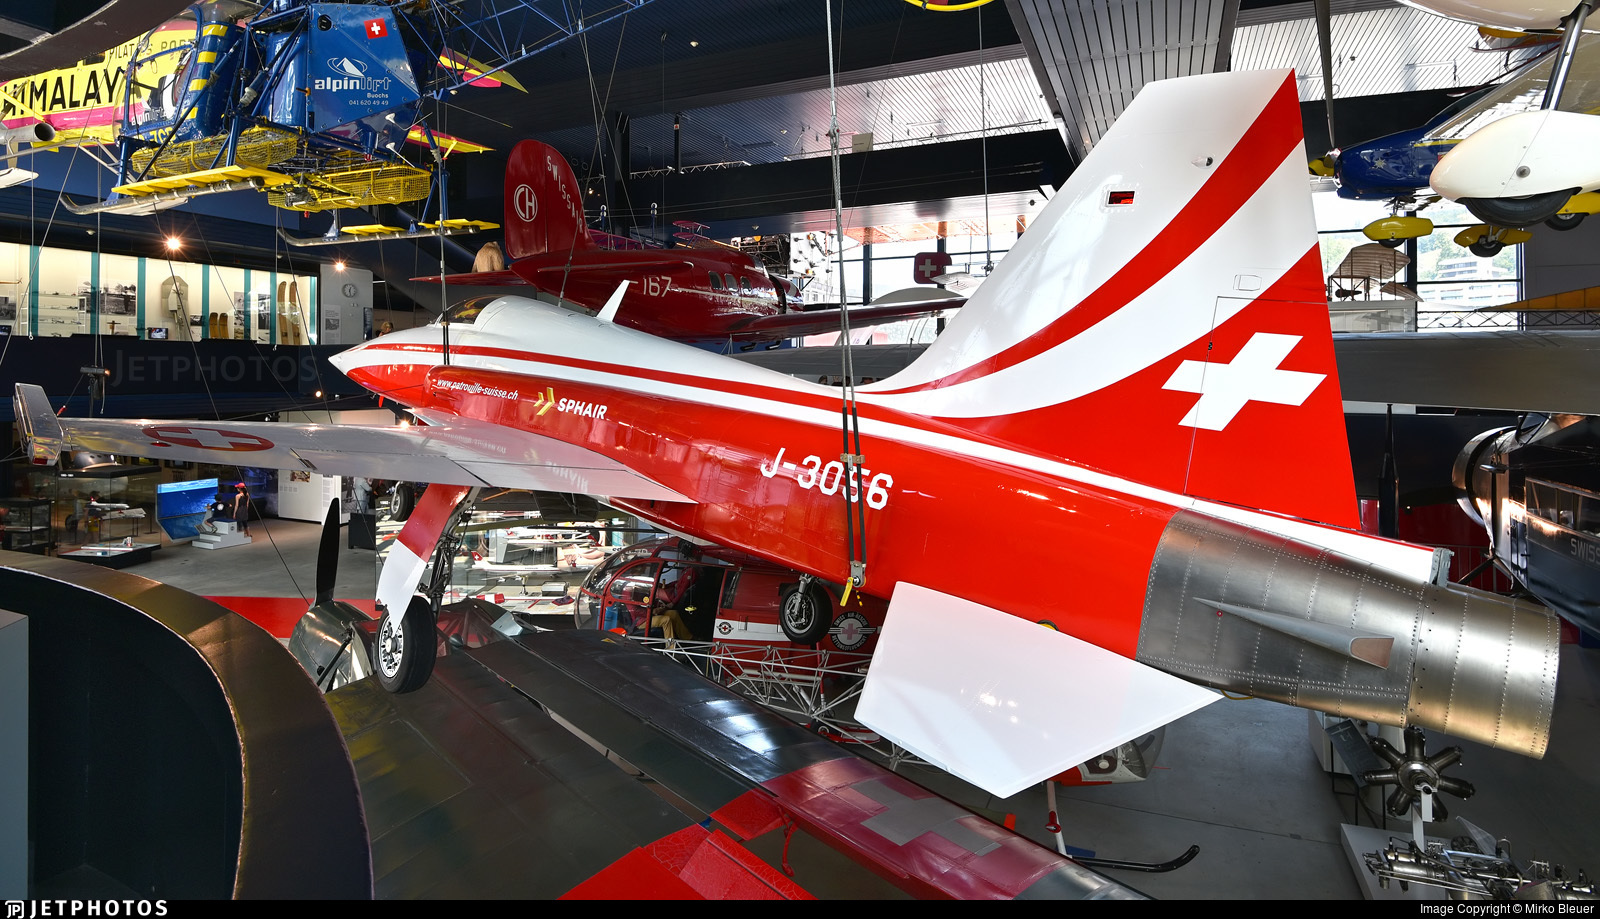 J-3056 - Northrop F-5E Tiger II - Switzerland - Air Force